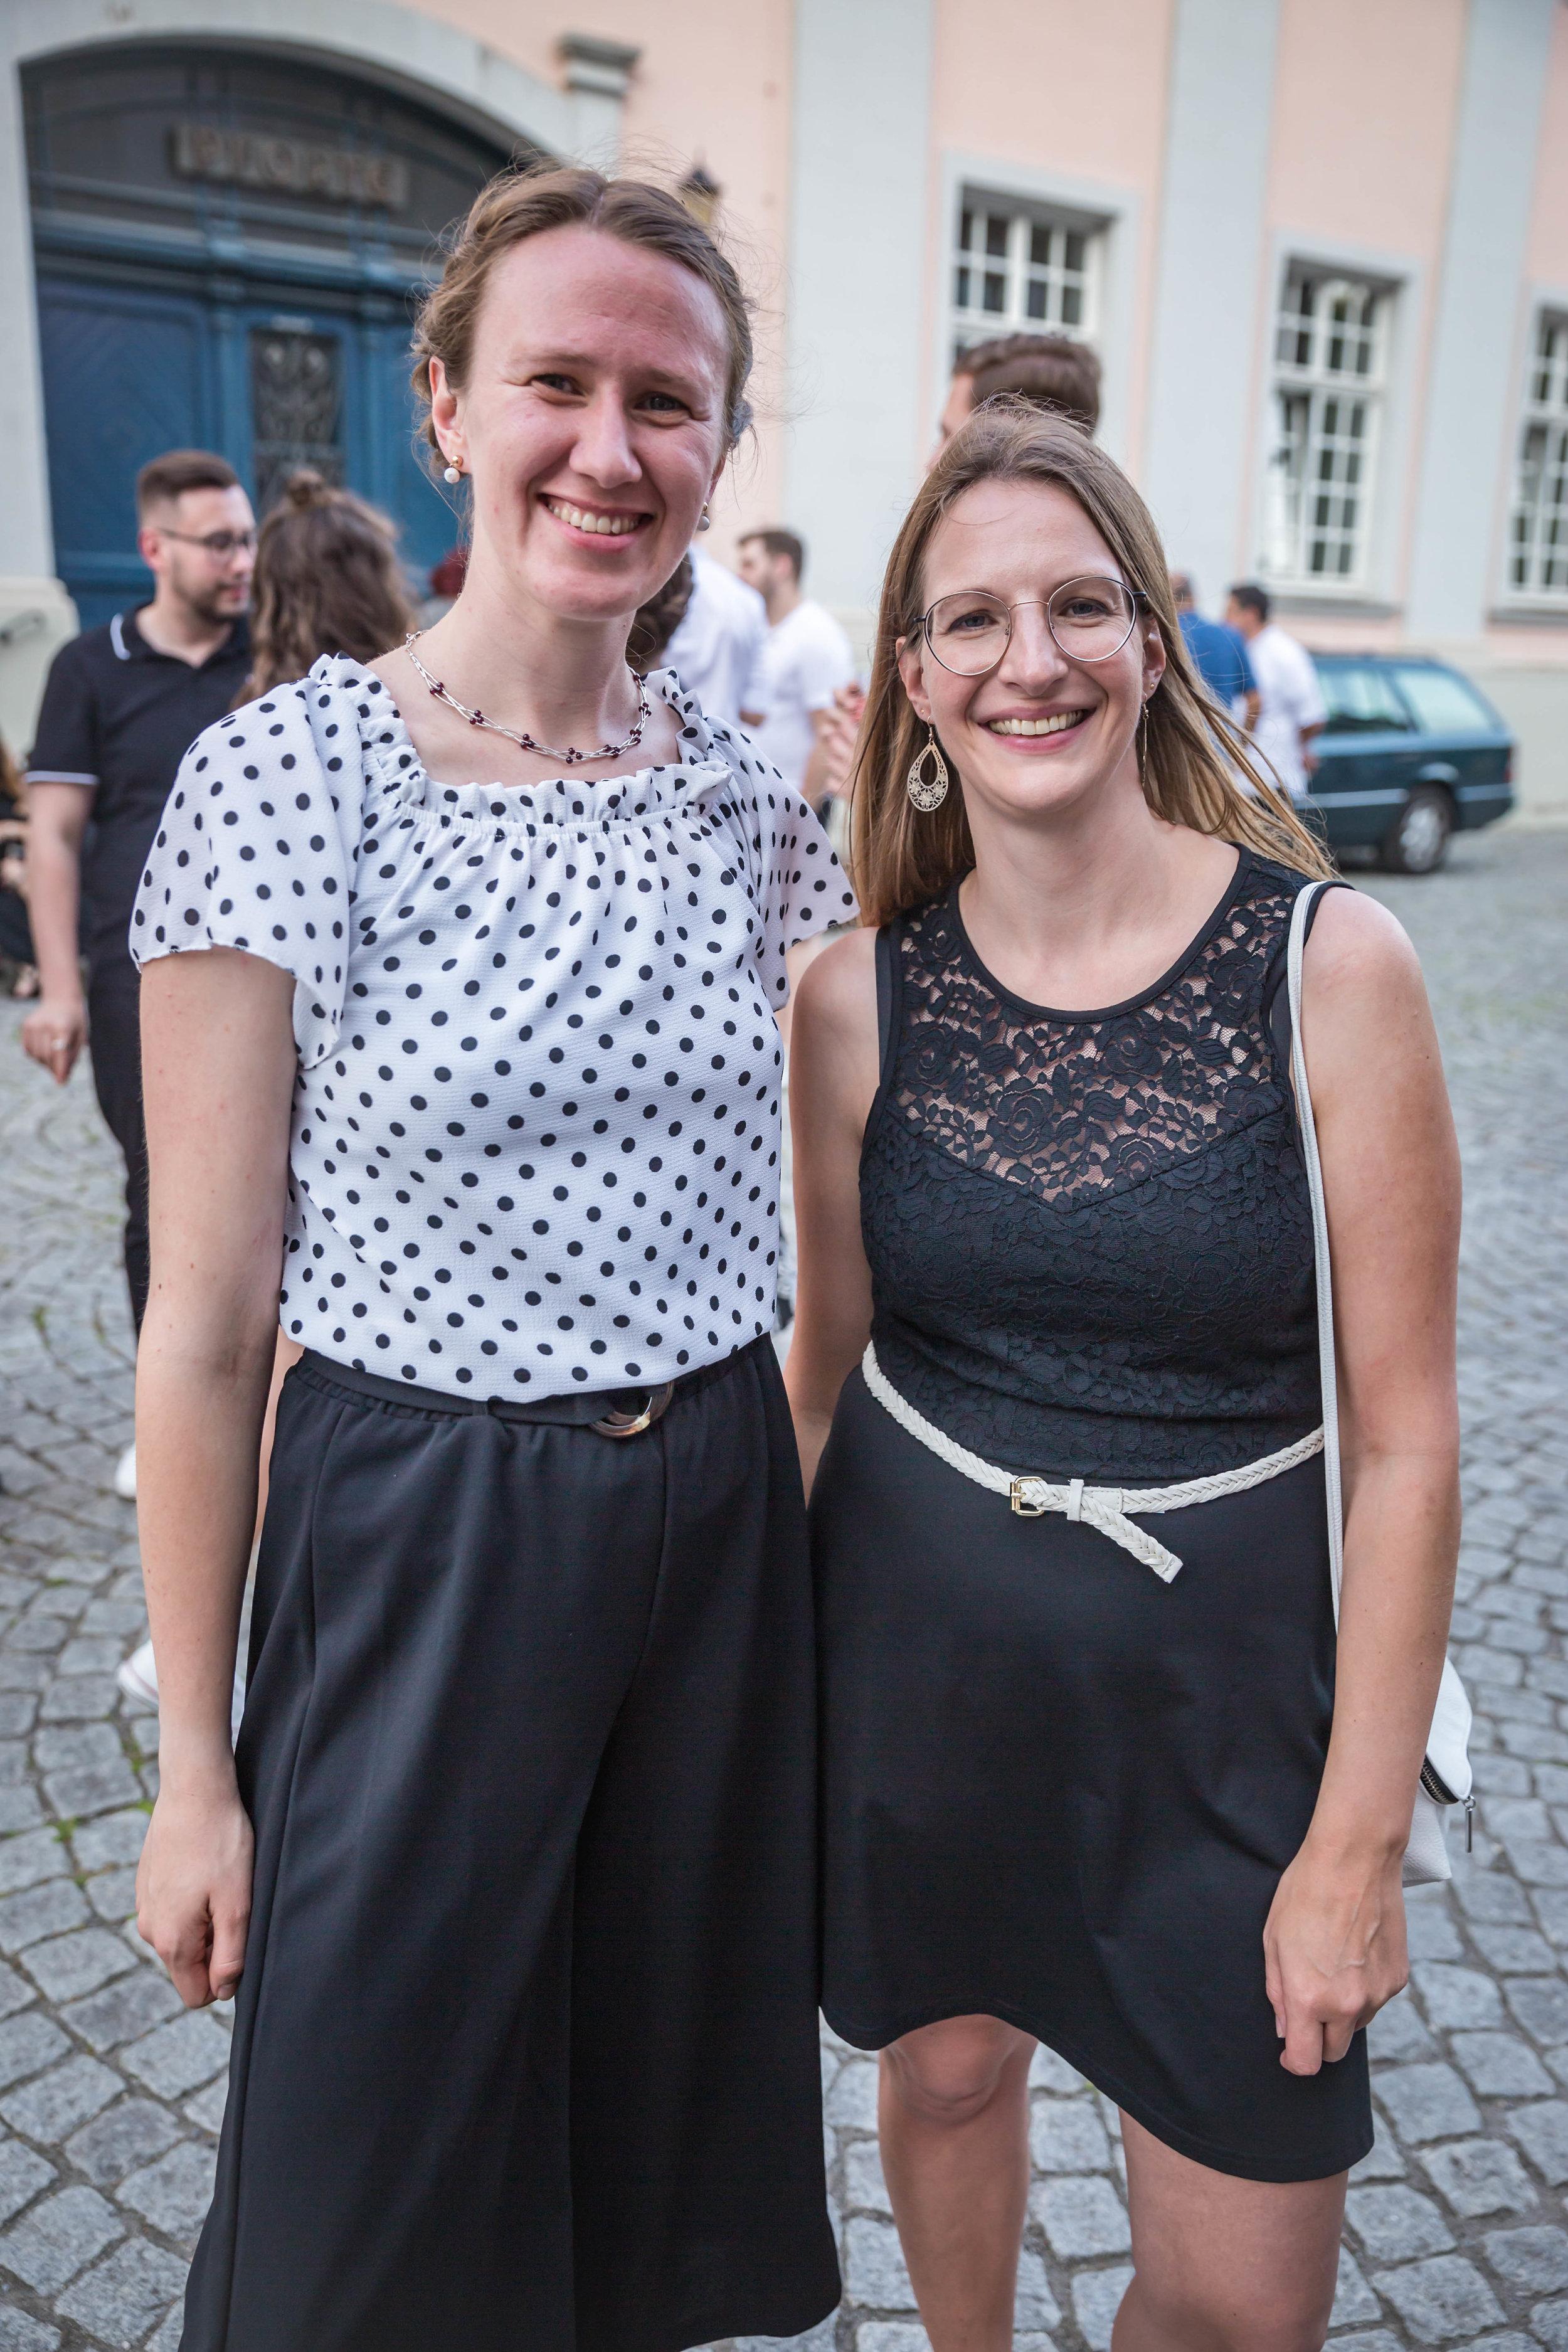 20190626_Akademie_40-jähriges_Jubiläum_FB_kl-5311931.jpg